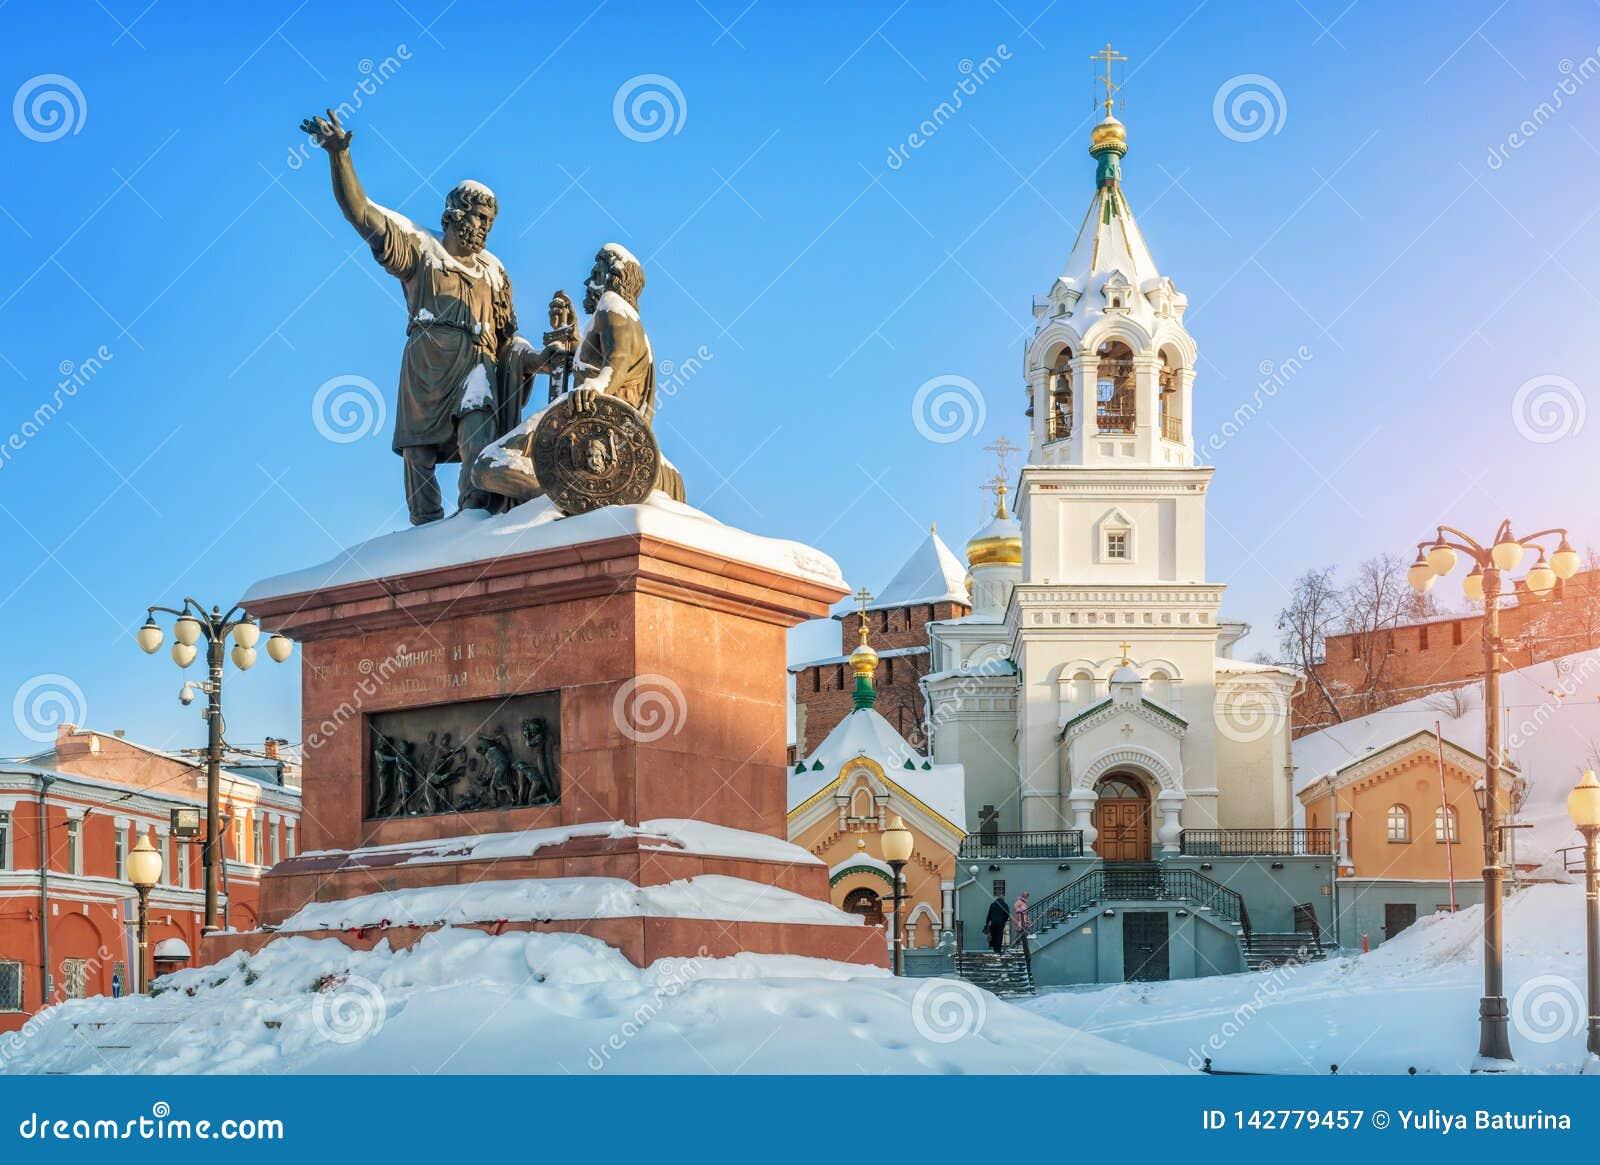 Kościół i zabytek Minin i Pozharsky